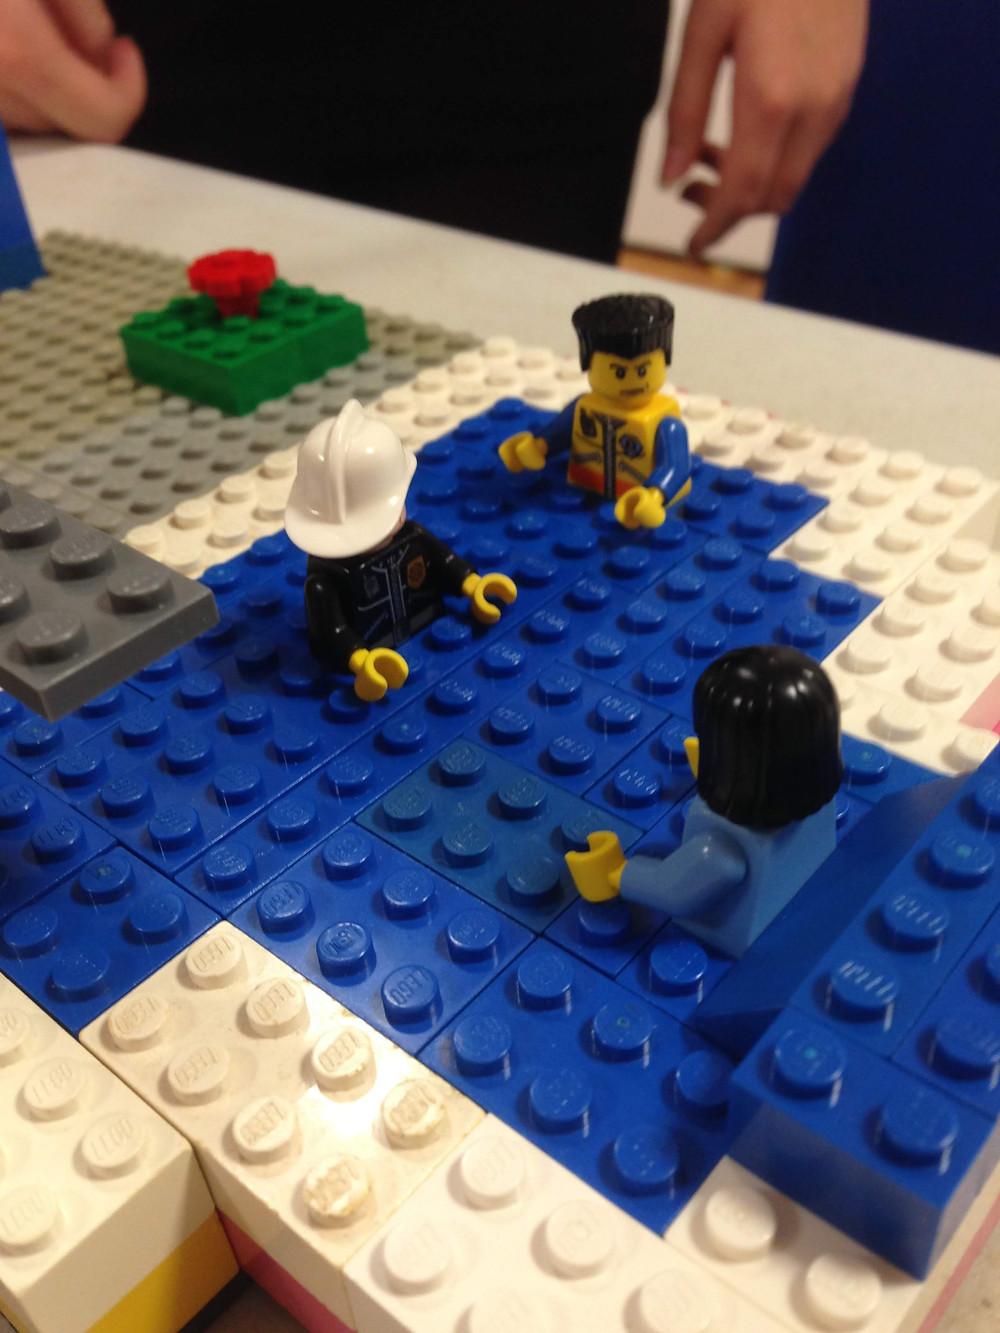 LEGO - the Promised Land